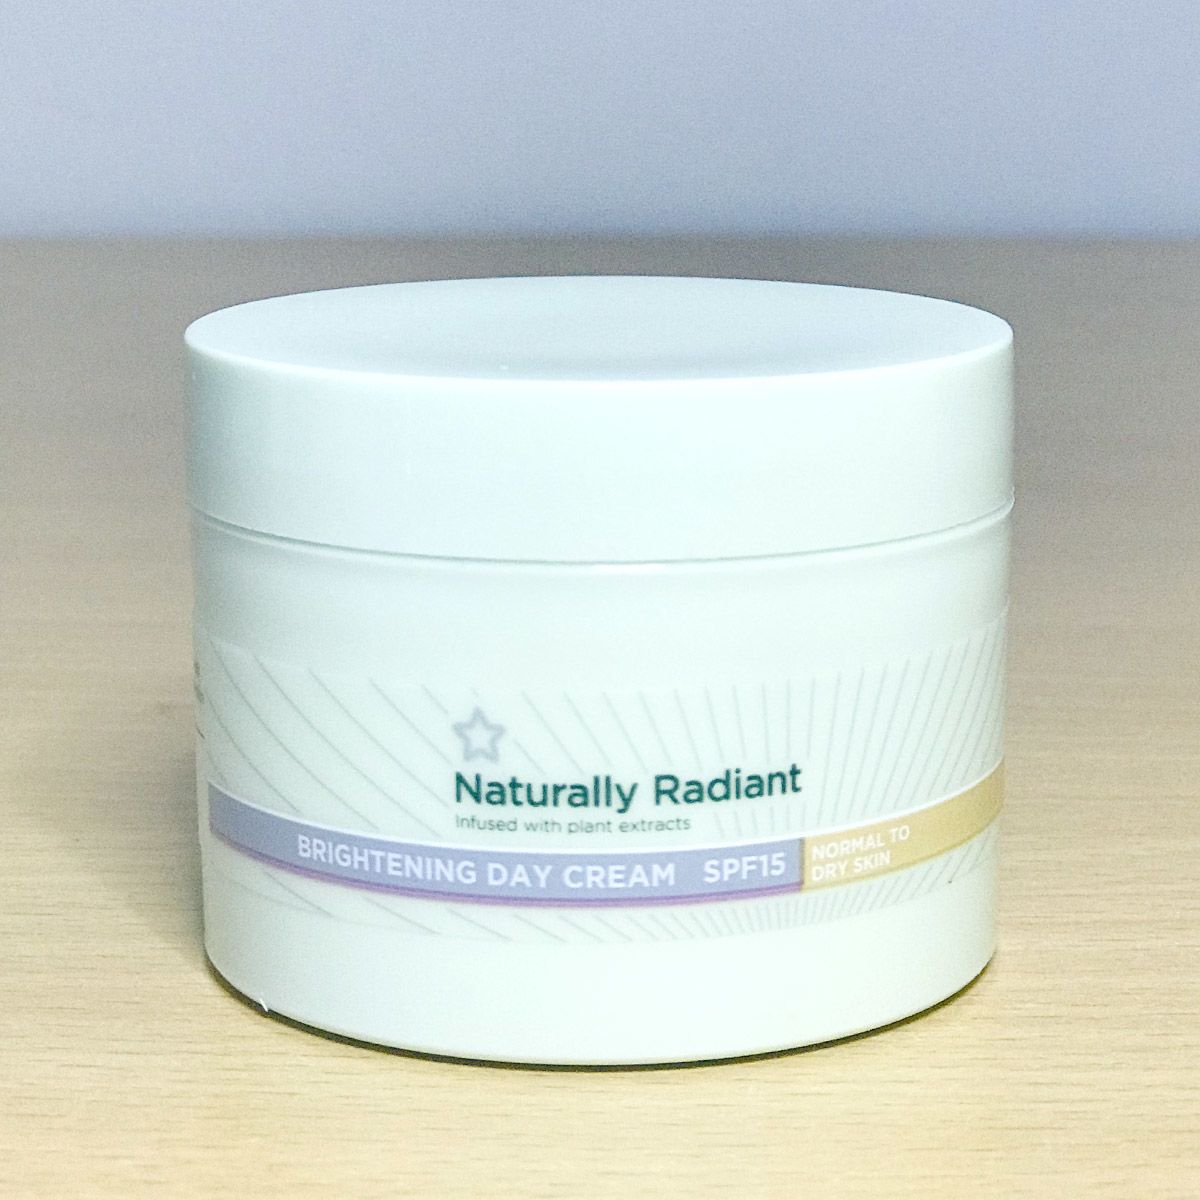 Superdrug Naturally Radiant Brightening Day Cream 75ml